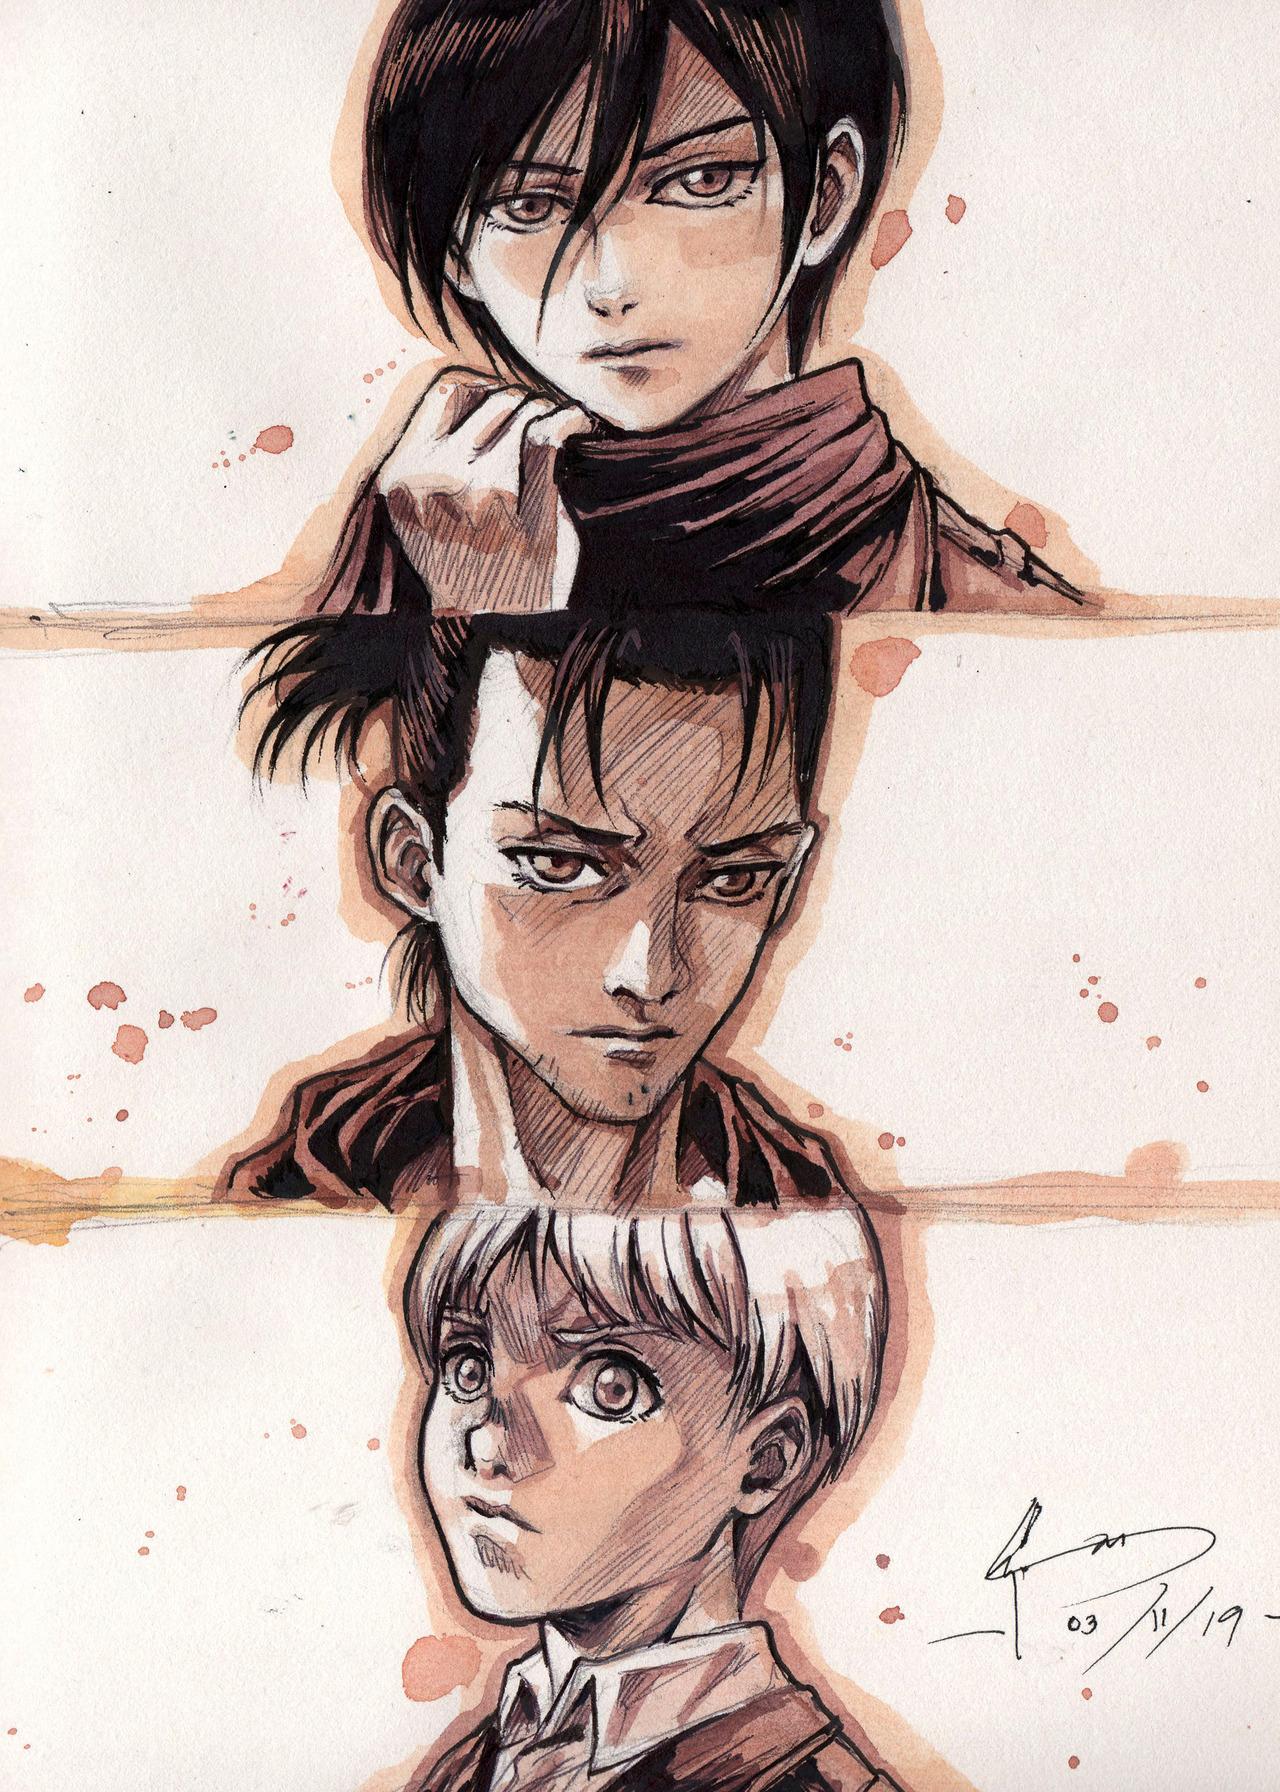 Armin Arlert Tumblr Attack On Titan Anime Attack On Titan Art Armin